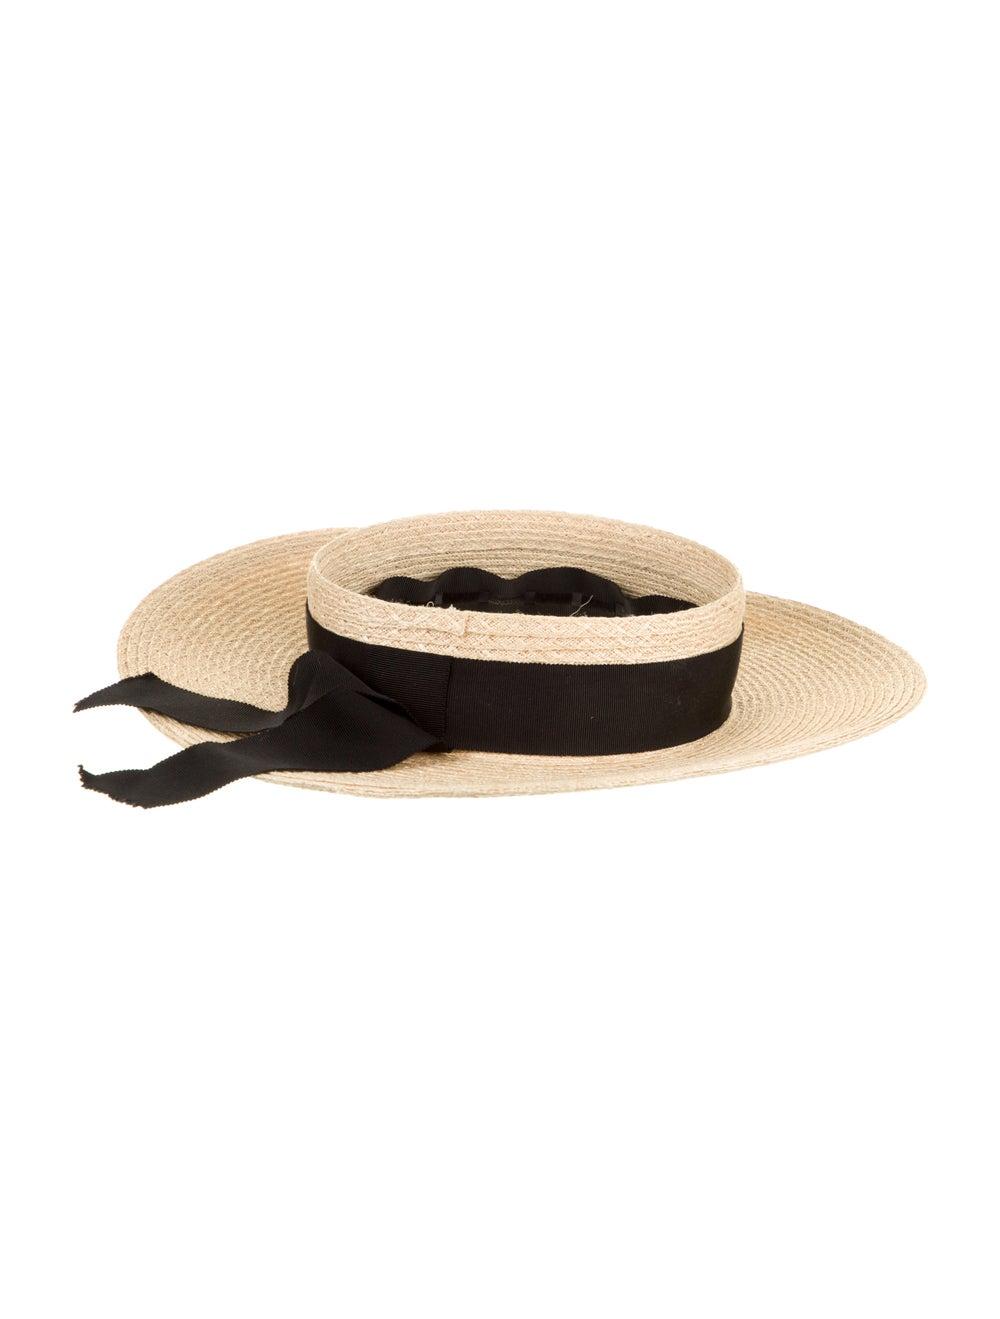 Eugenia Kim Straw Wide Brim Hat Tan - image 2